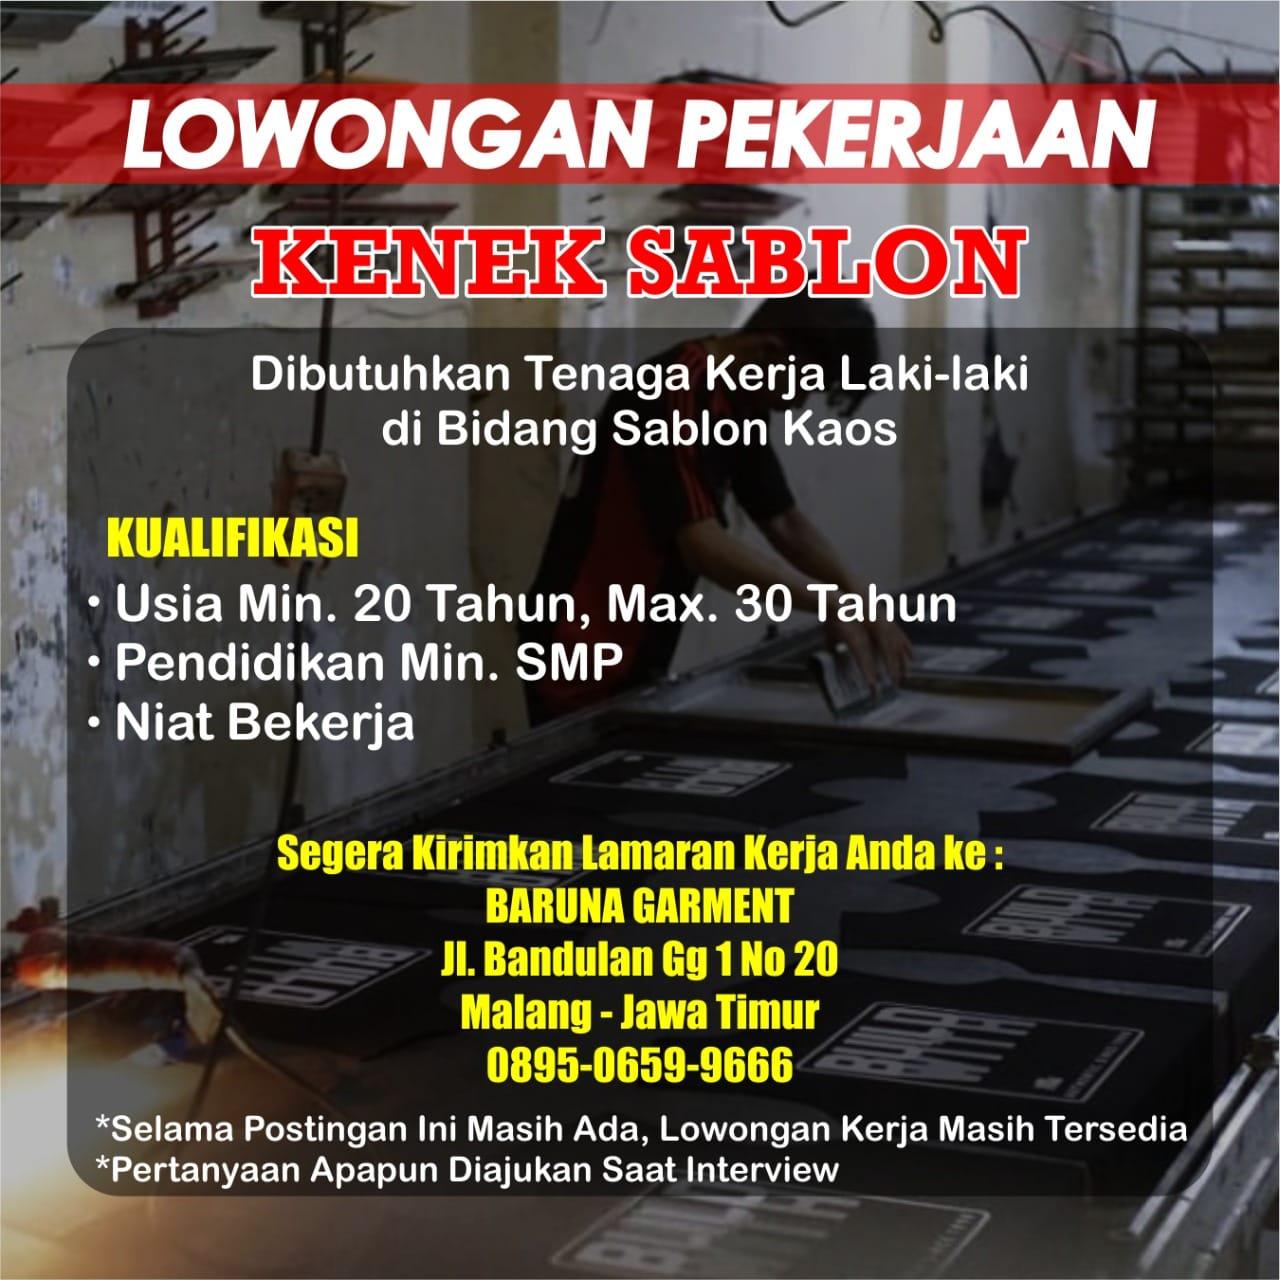 Loker Lowongan Kerja Kenek Sablon Baruna Garment Di Malang Kpop Squad Media All About K Pop And Intermezzo